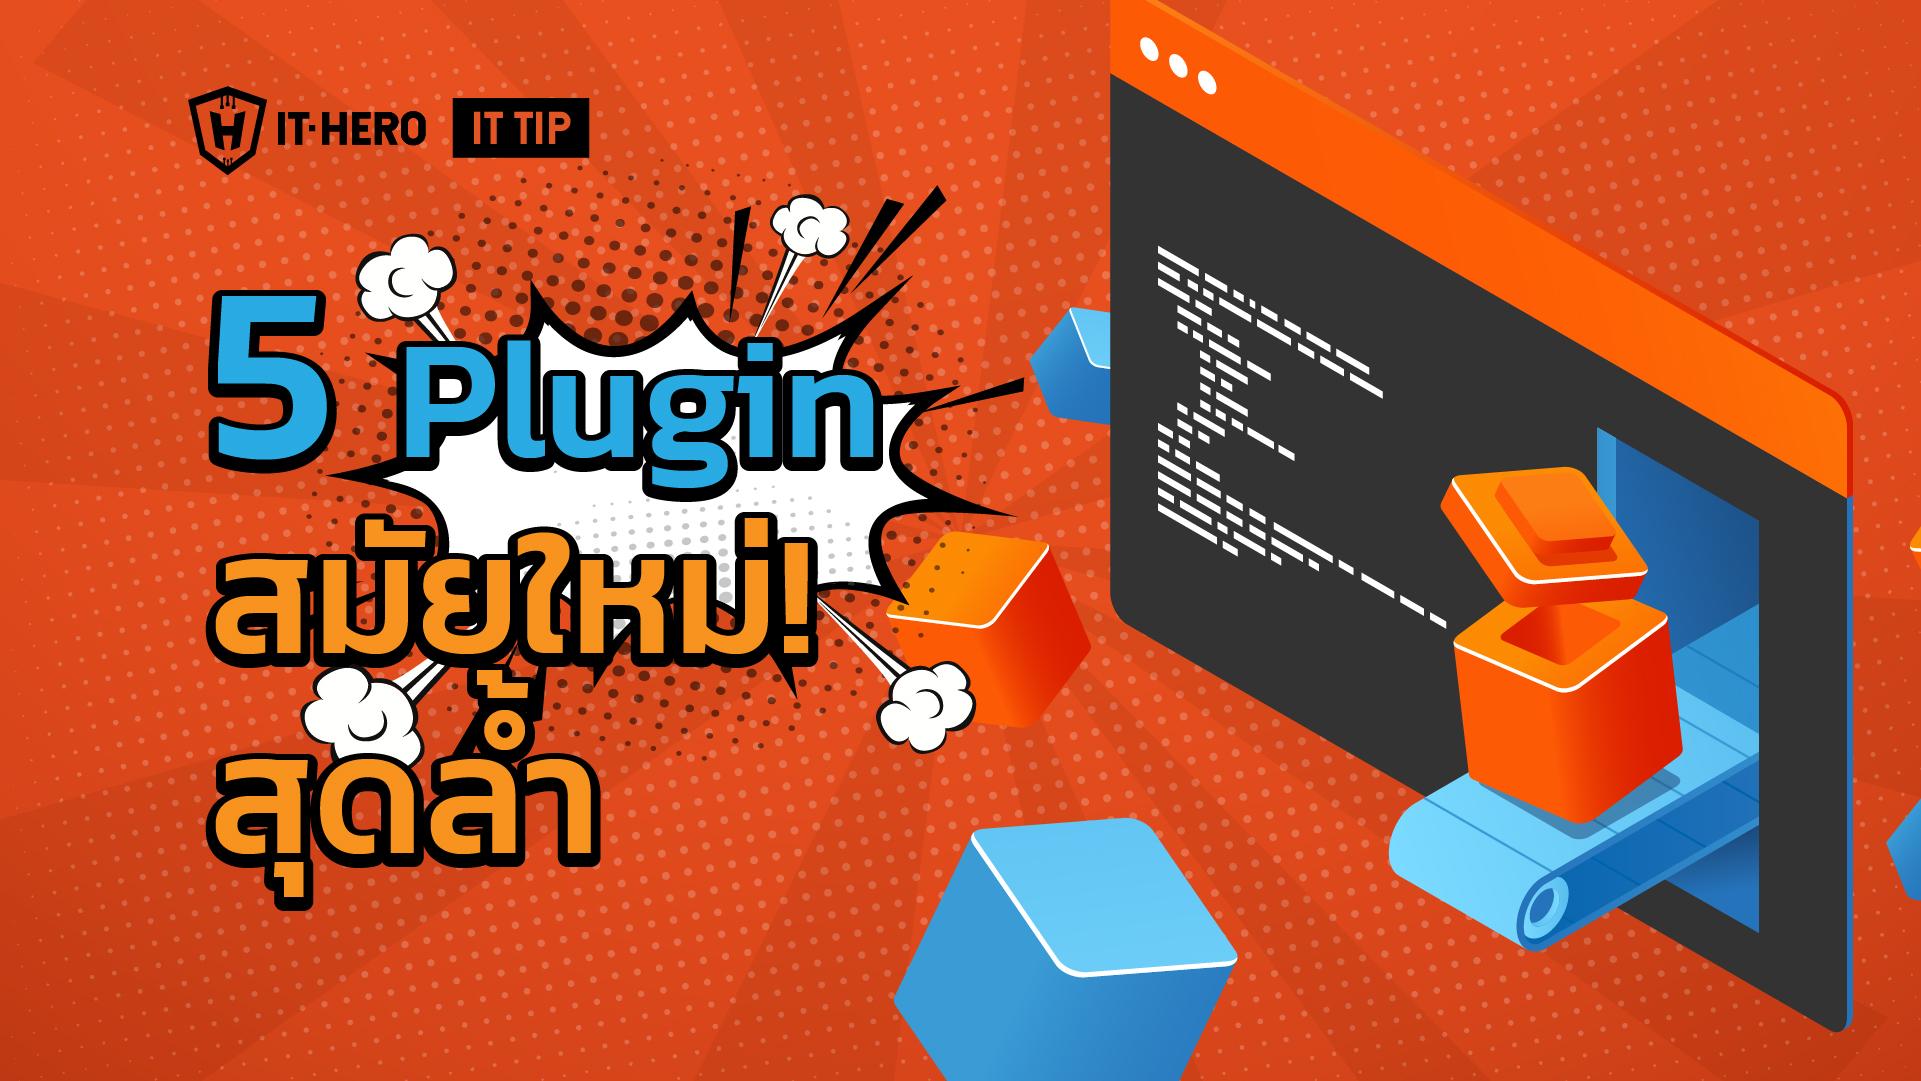 5 Plugin Browser ที่มีไว้สำหรับชาว Officer สมัยใหม่ สุดล้ำ